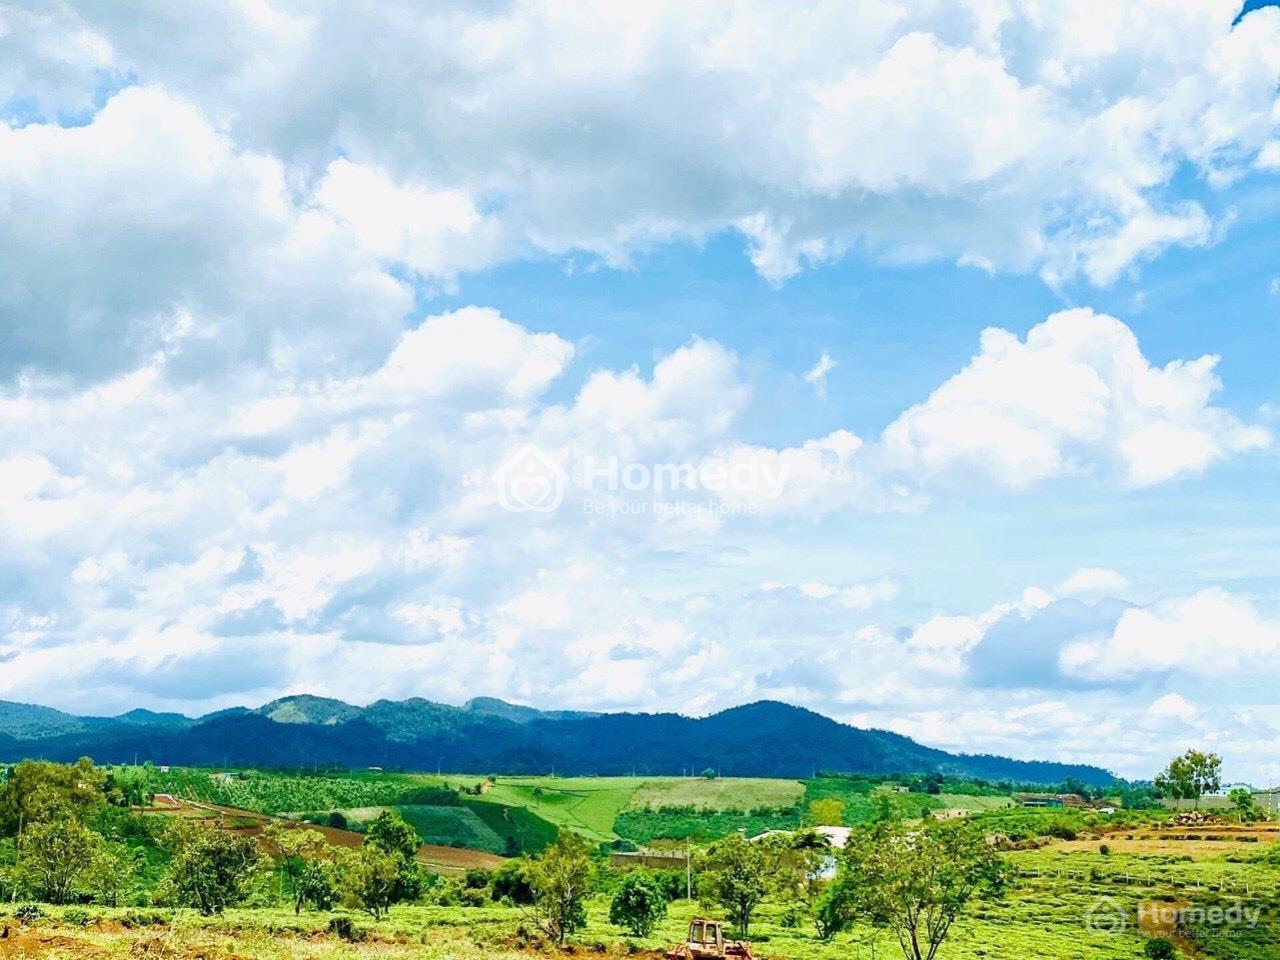 Forest Hill Bảo Lộc